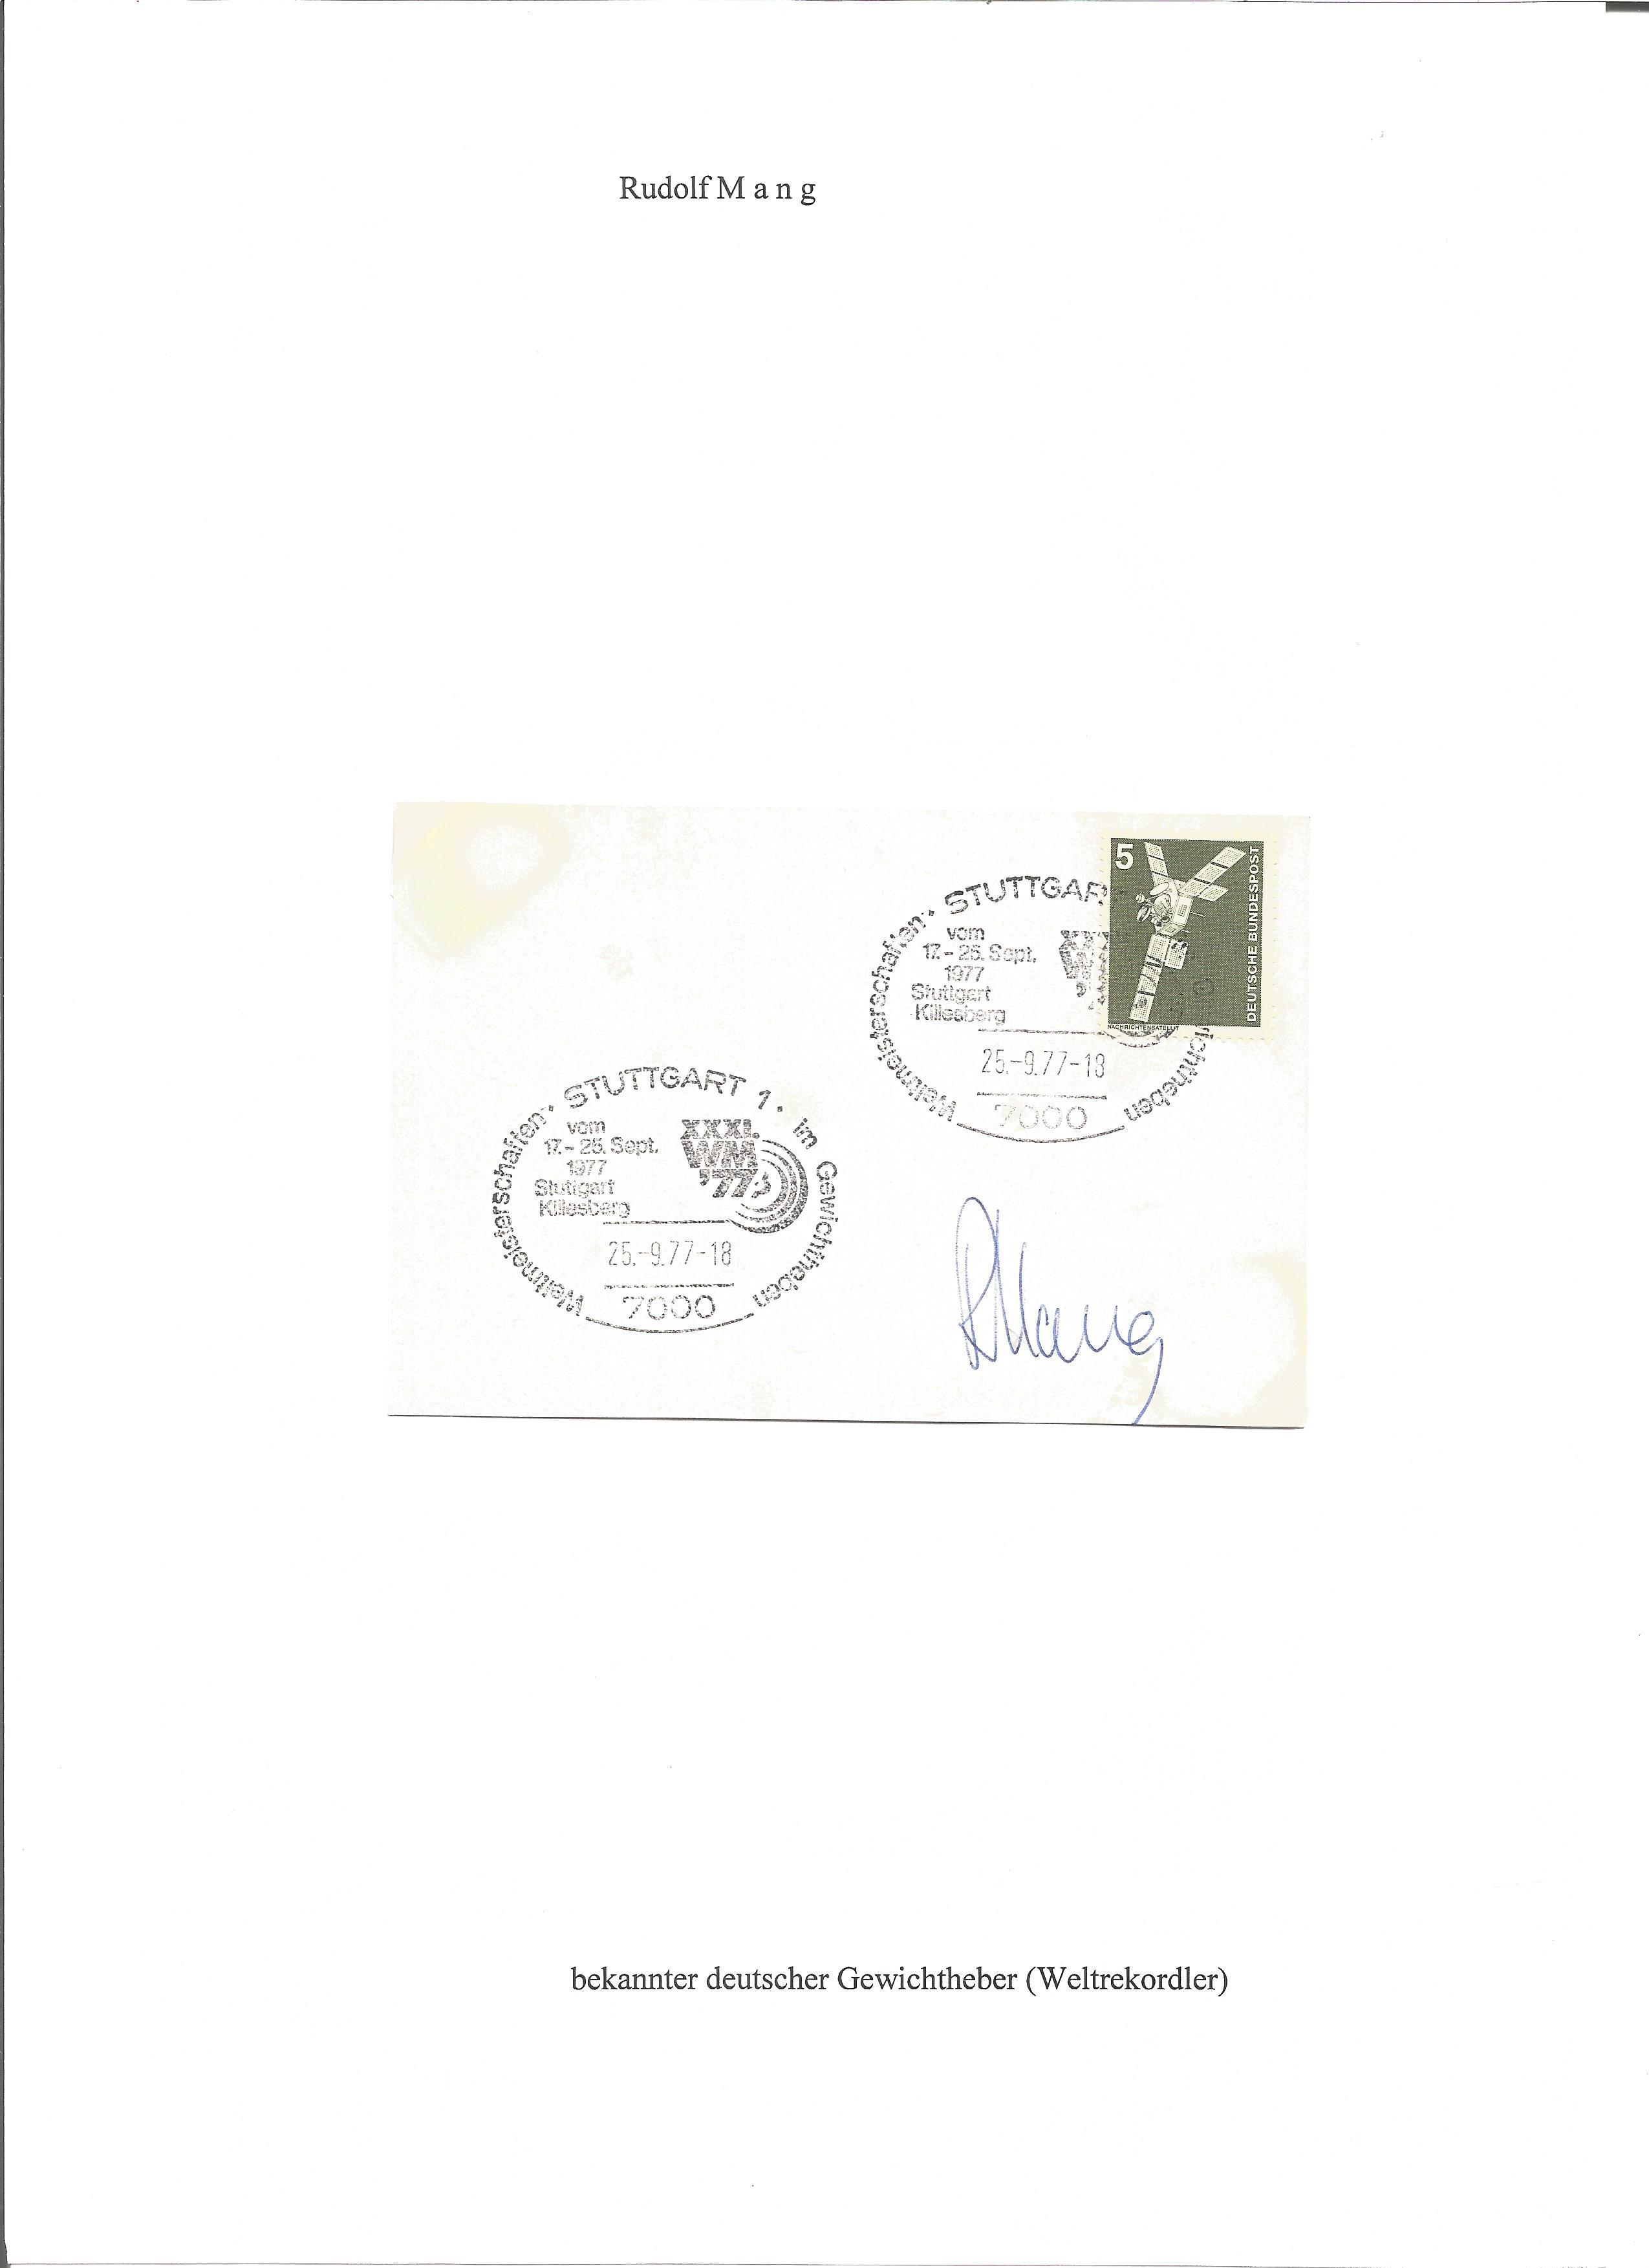 Lot 231 - Olympics Rudolf Mang signed vintage envelope Double PM Stuttgart 25-9. 77-18. Rudolf Mang 17 June